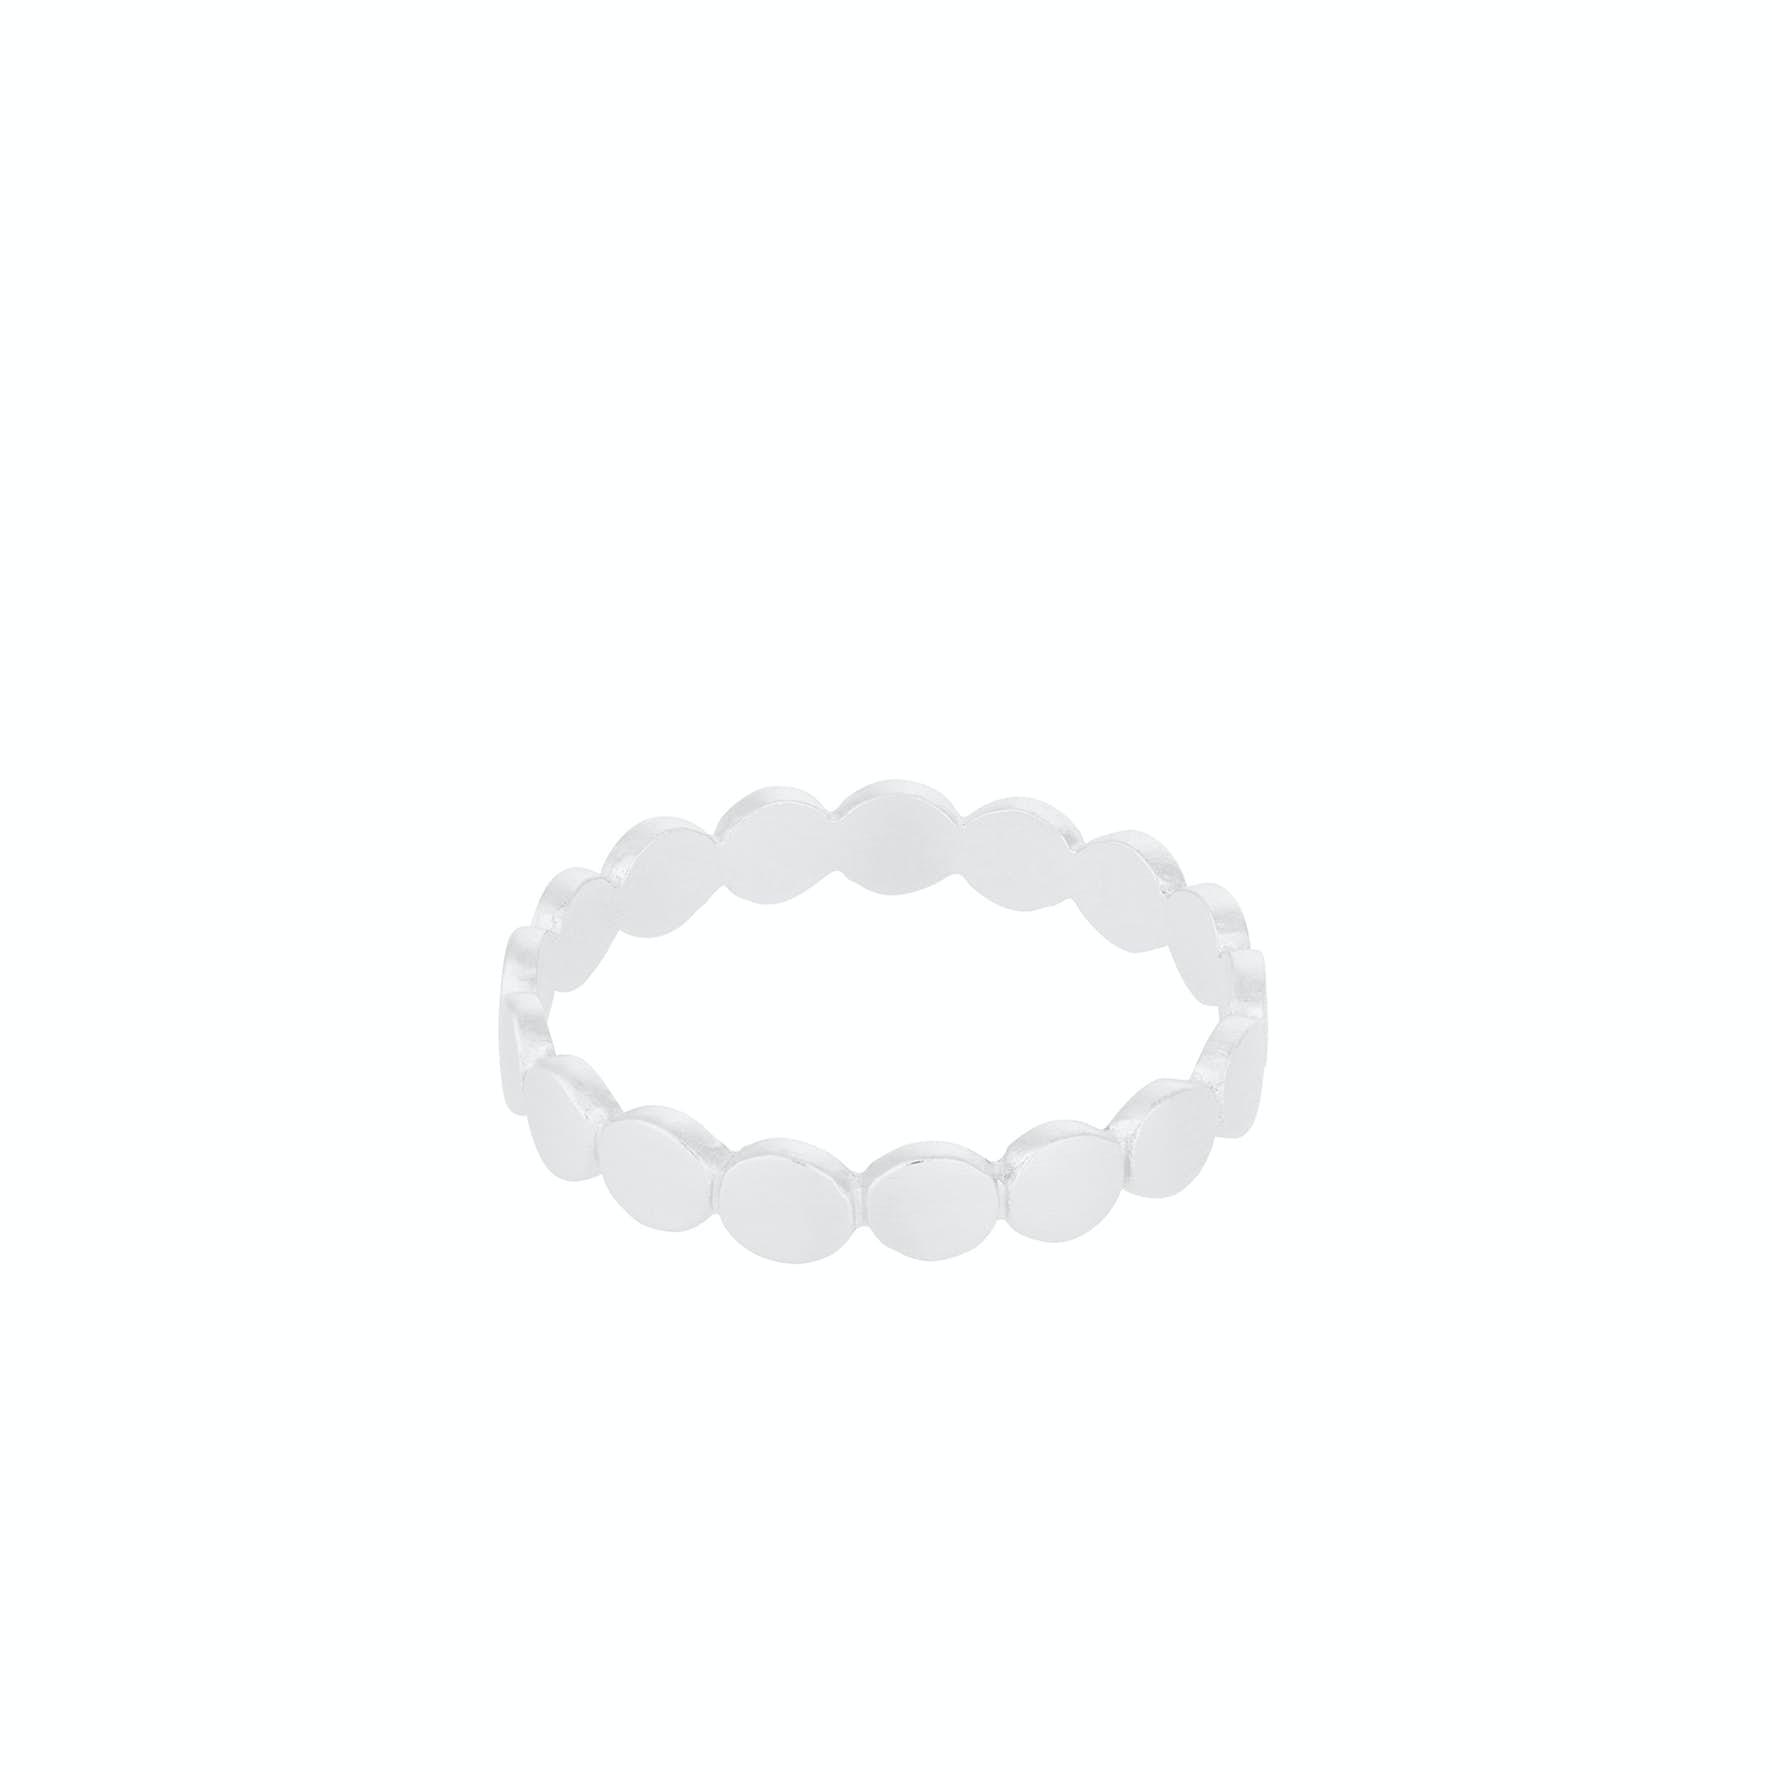 Catana Ring von Pernille Corydon in Silber Sterling 925